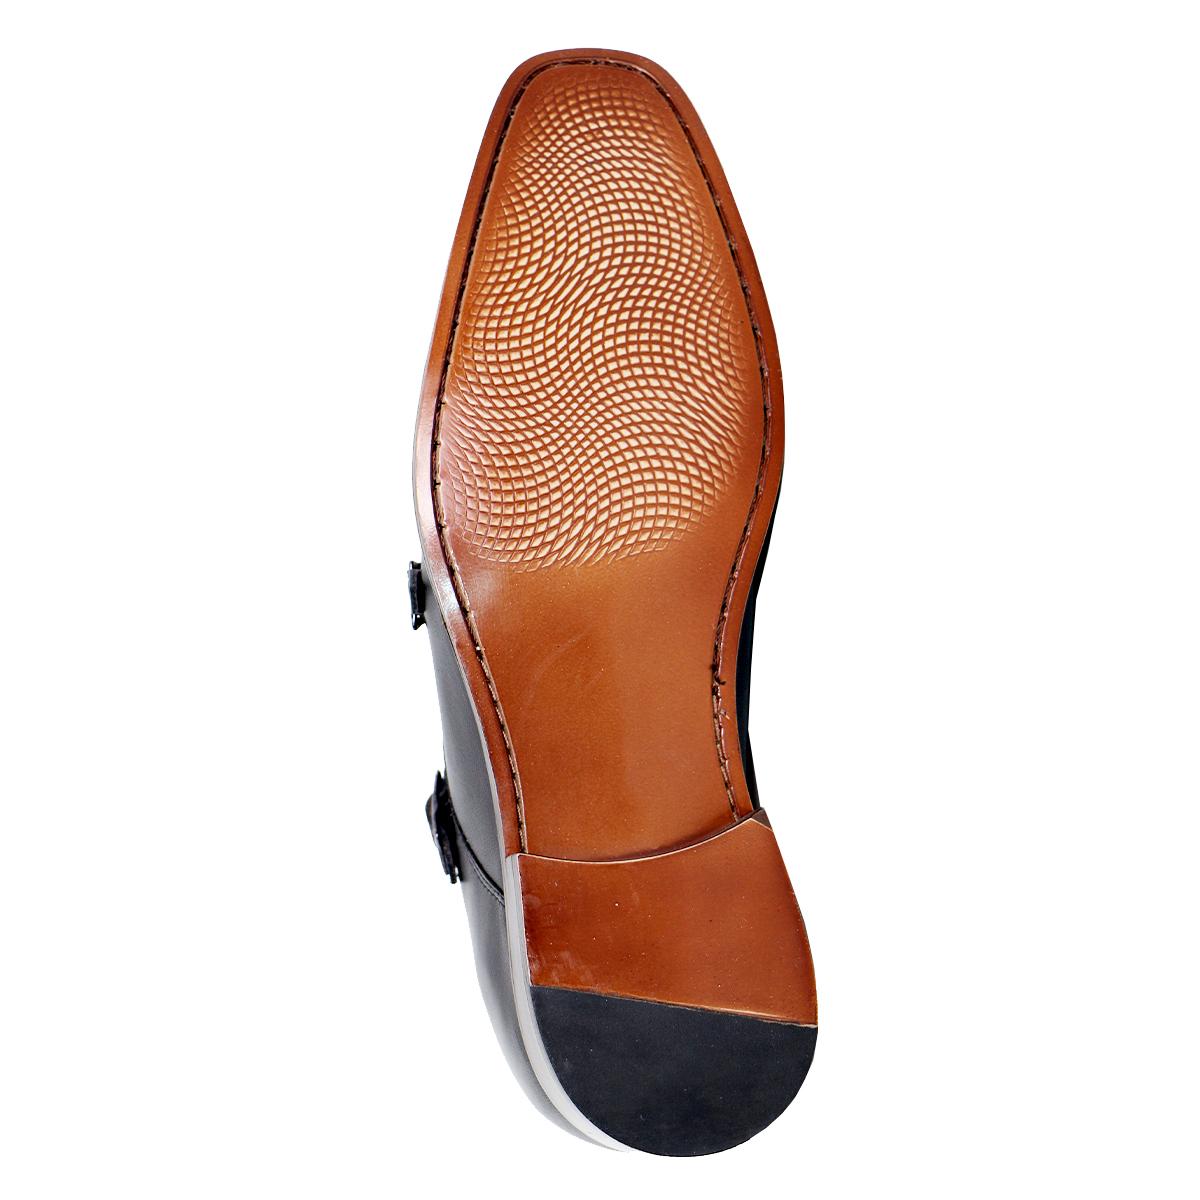 Zapato Formal Lawyers Negro Max Denegri +7cms De Altura_72744